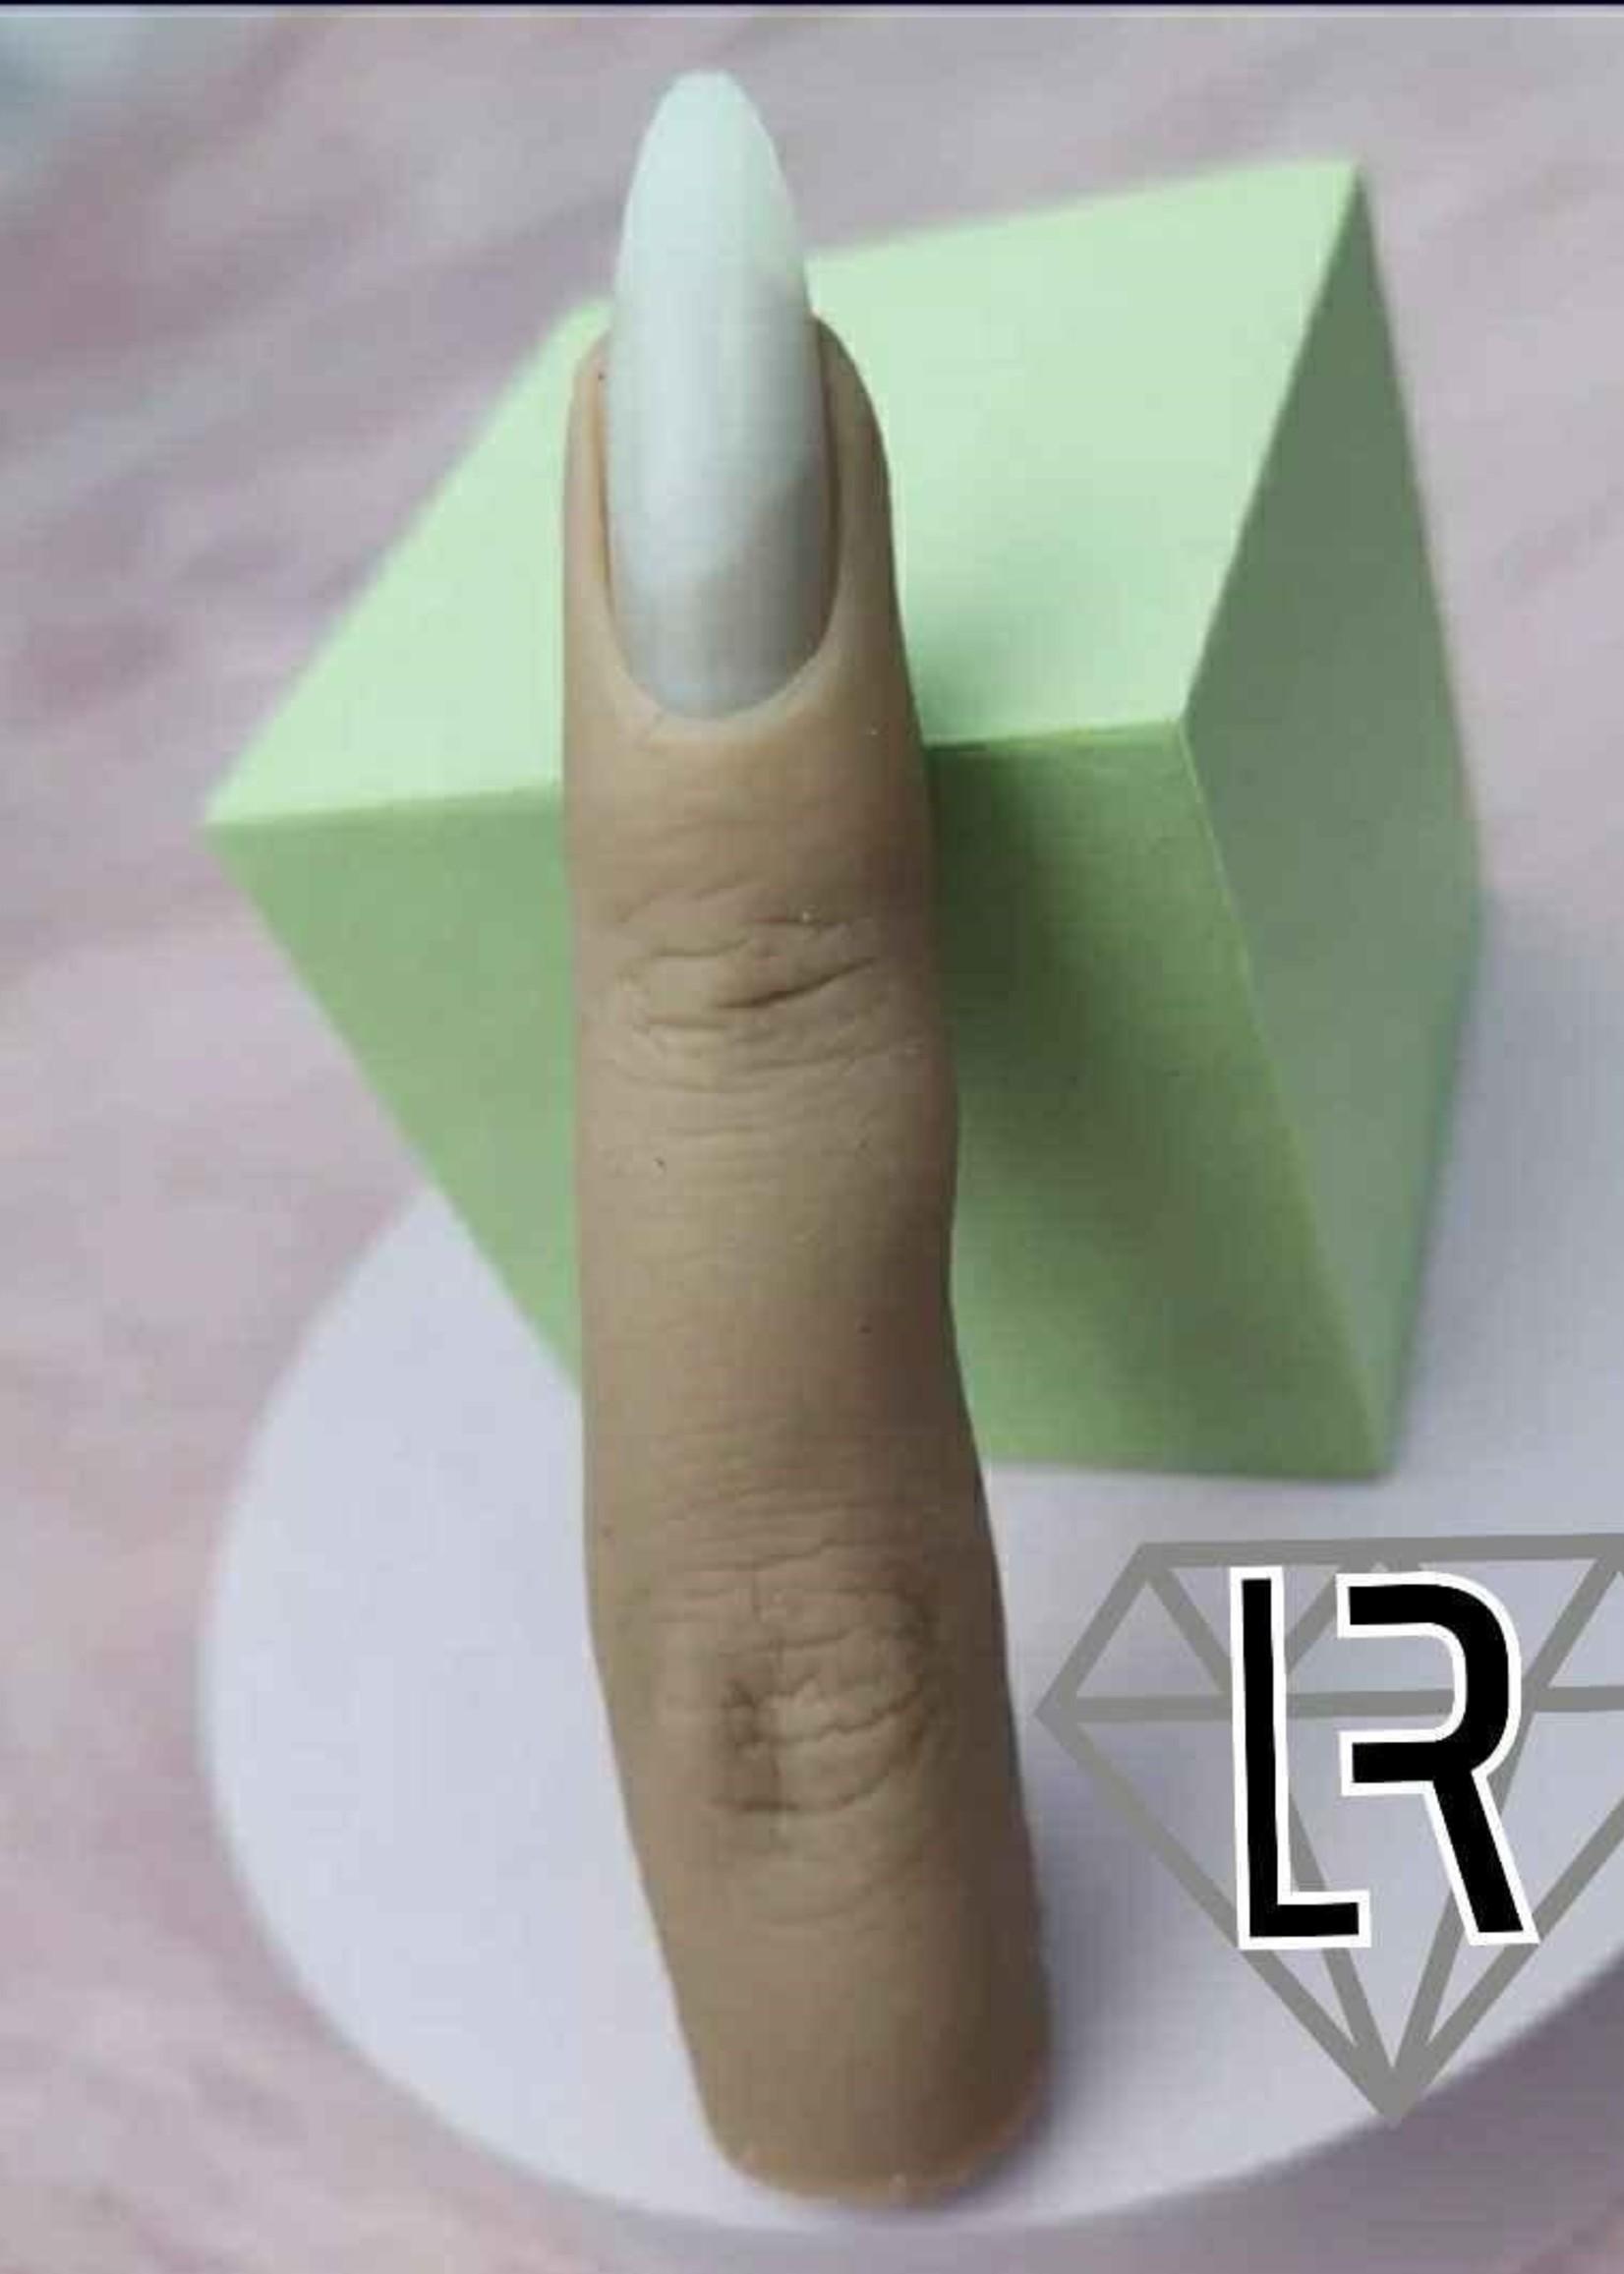 La Ross Silicone Practice Finger